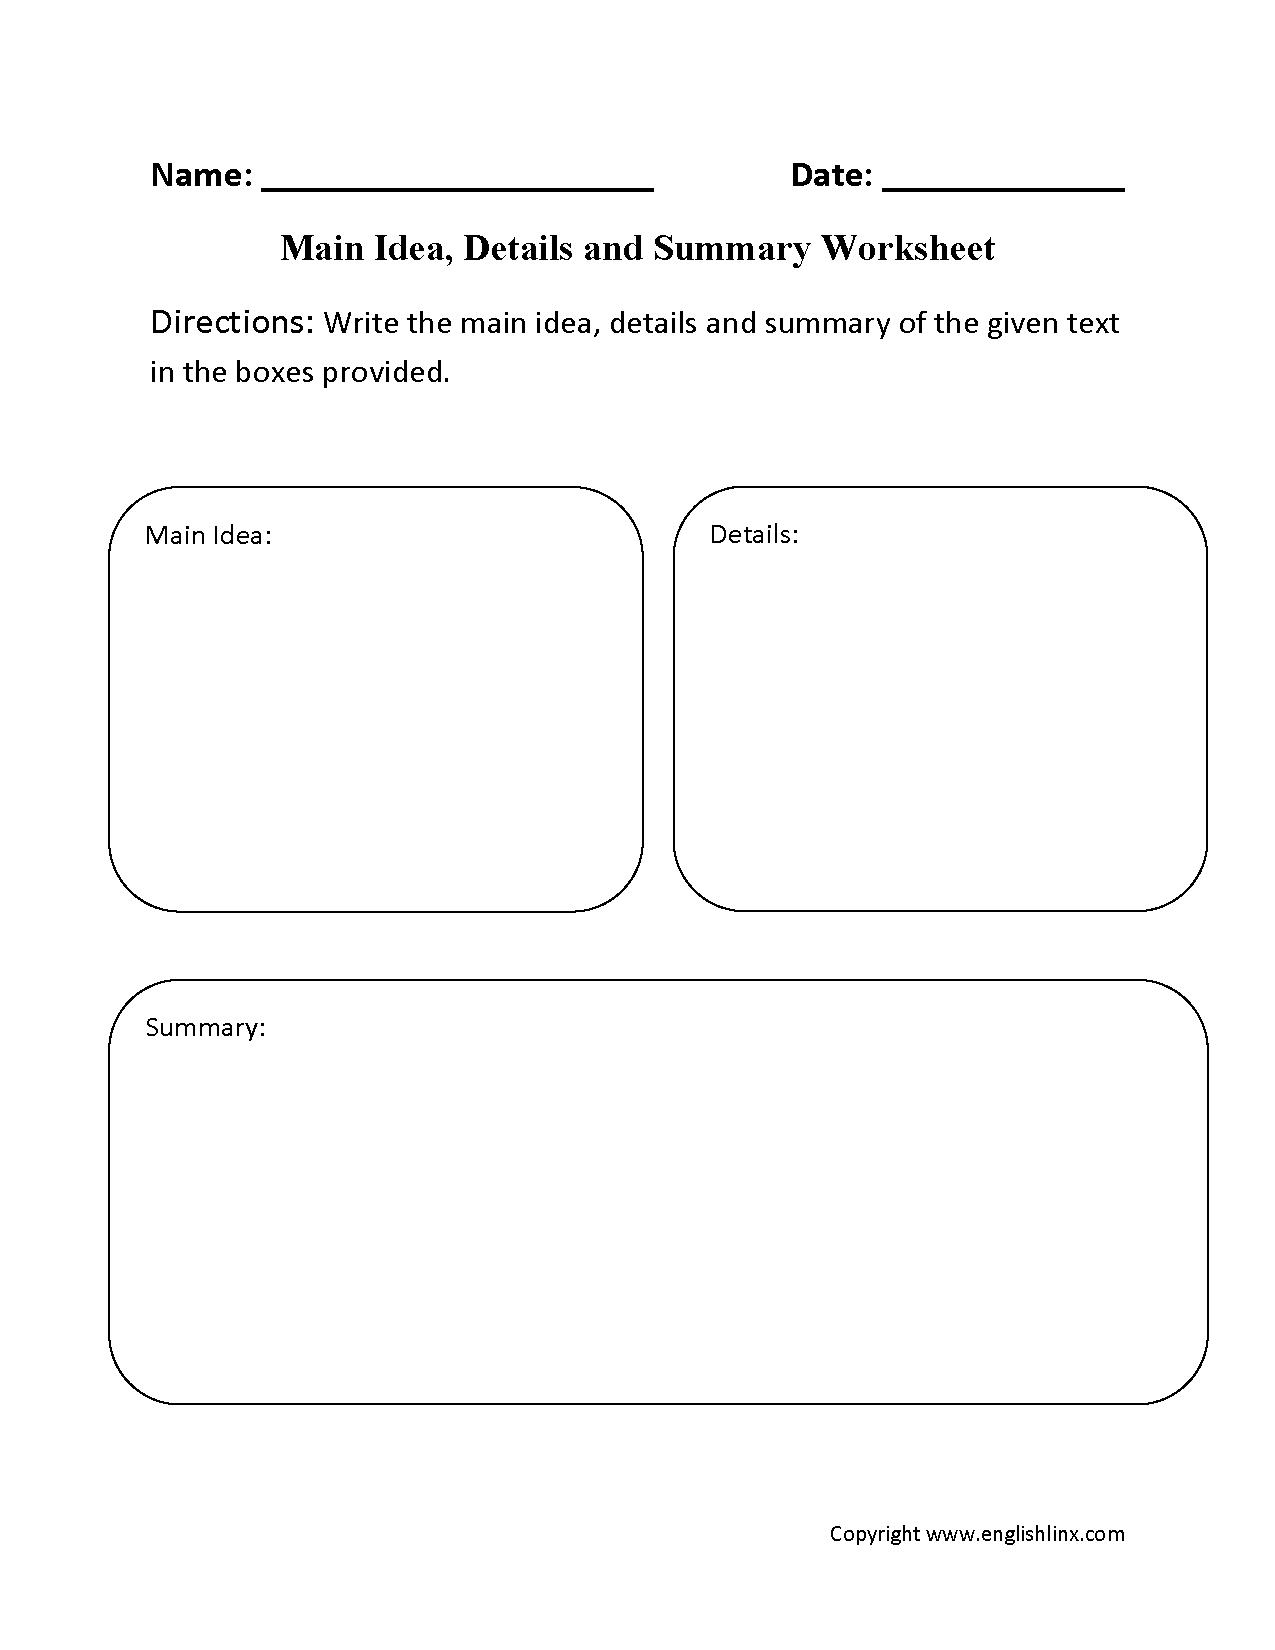 Reading Worksheets Main Idea Worksheets Reading Worksheets Reading Summary Worksheet Main Idea Worksheet